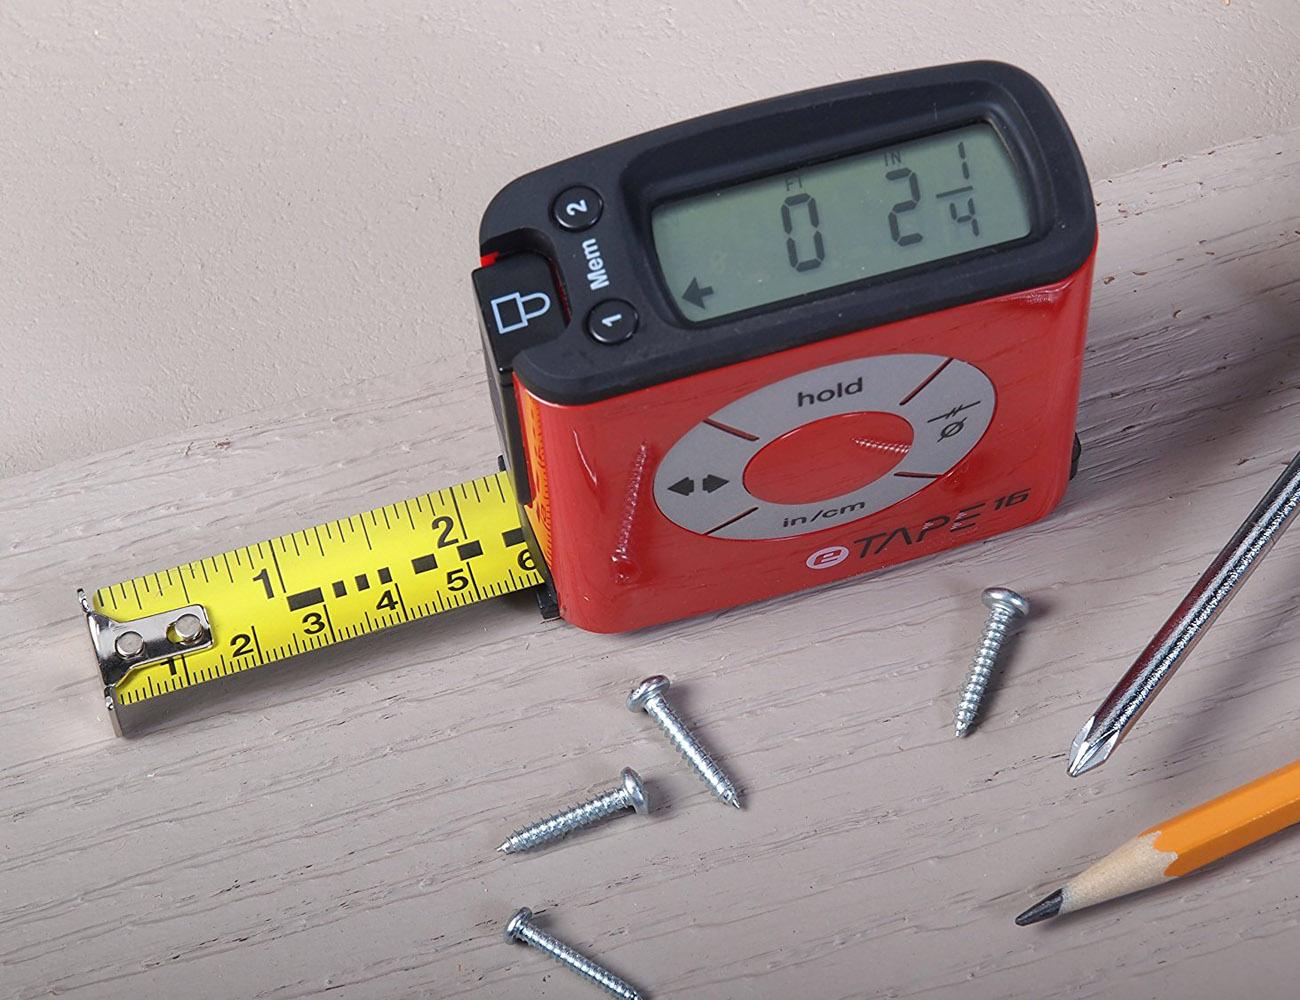 eTape16 Digital Tape Measure